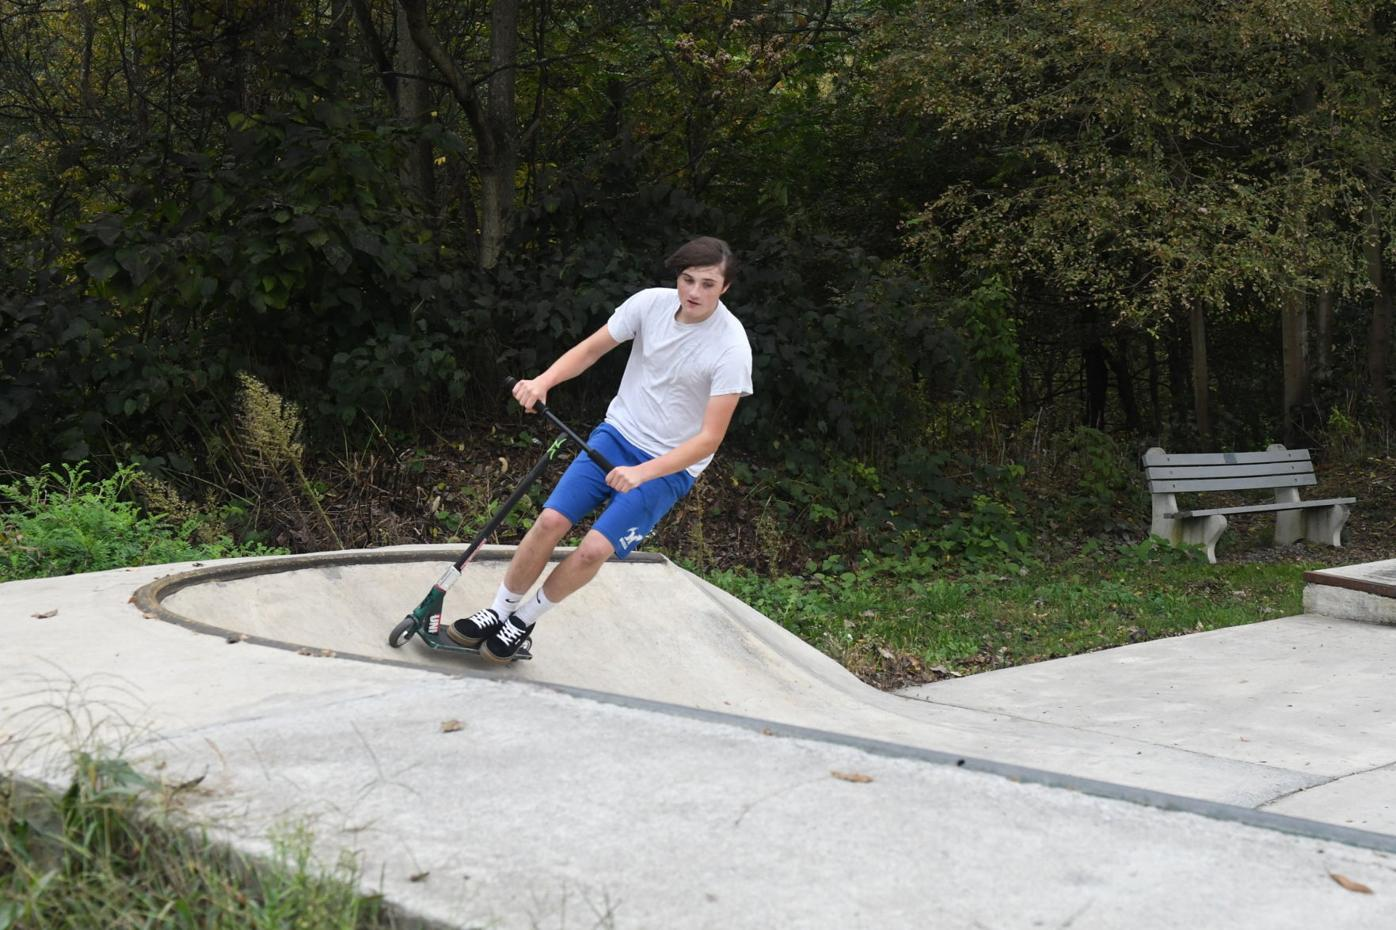 Minersville Skate Park